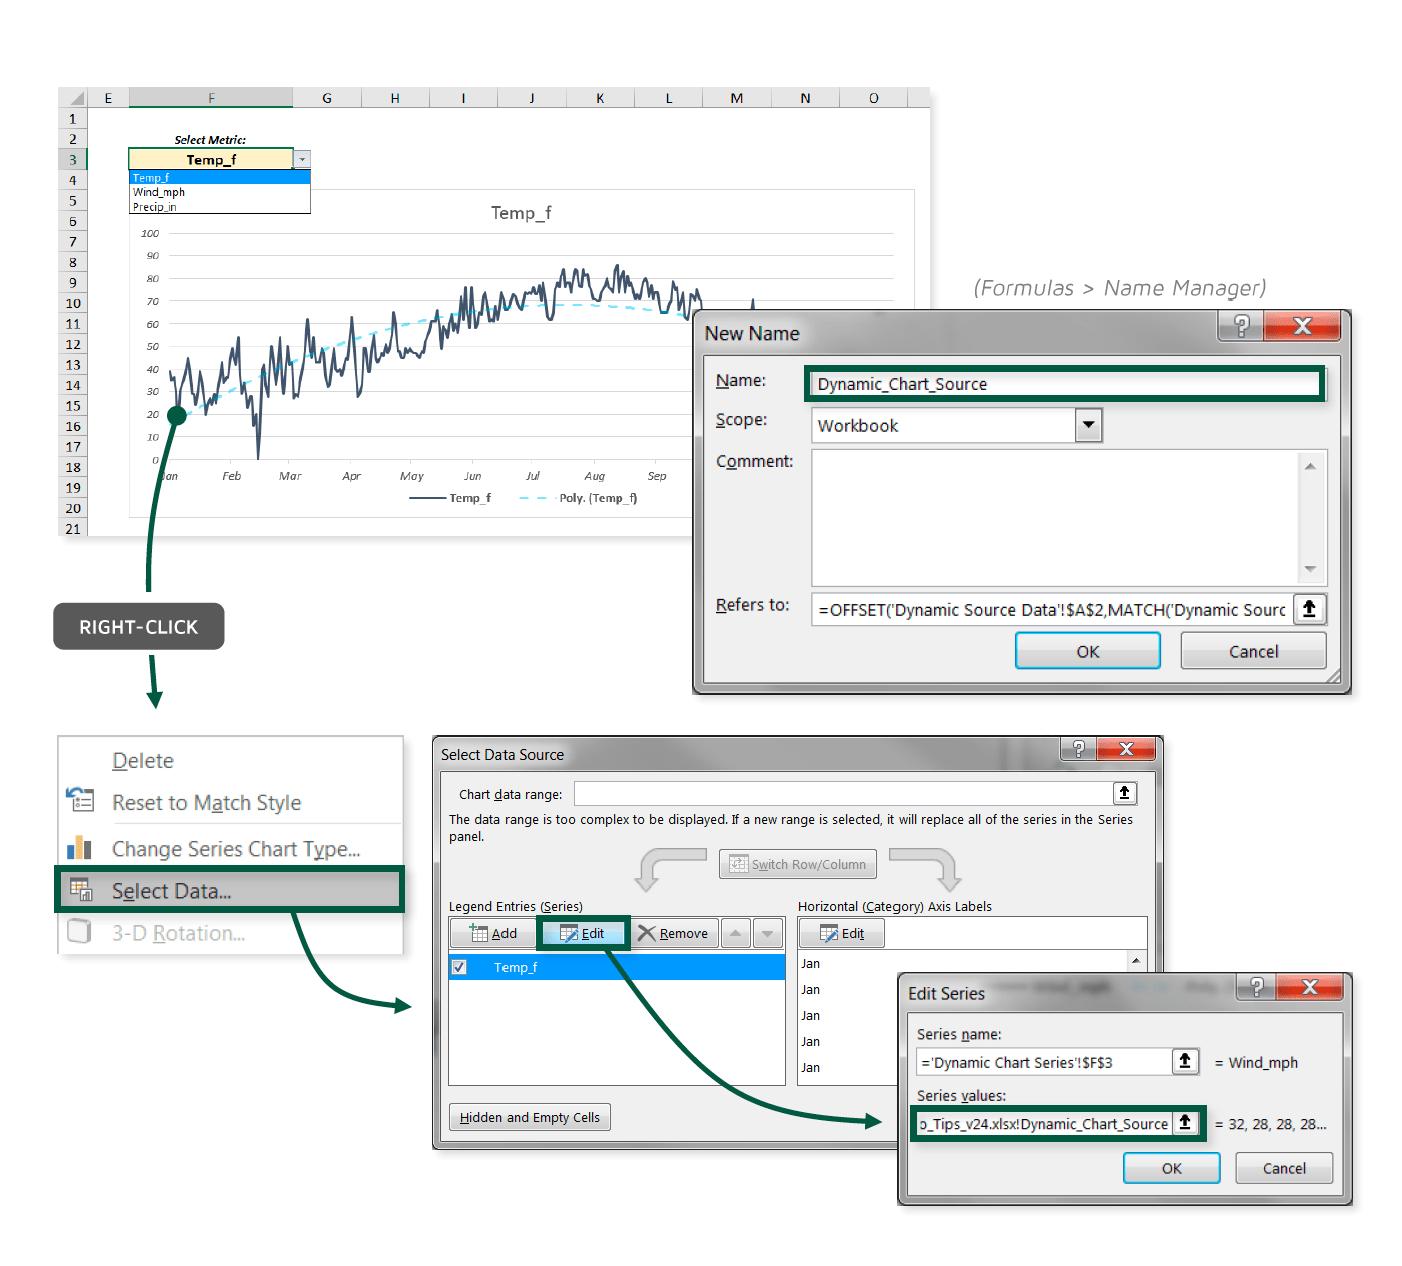 Dynamic Chart Source Ranges